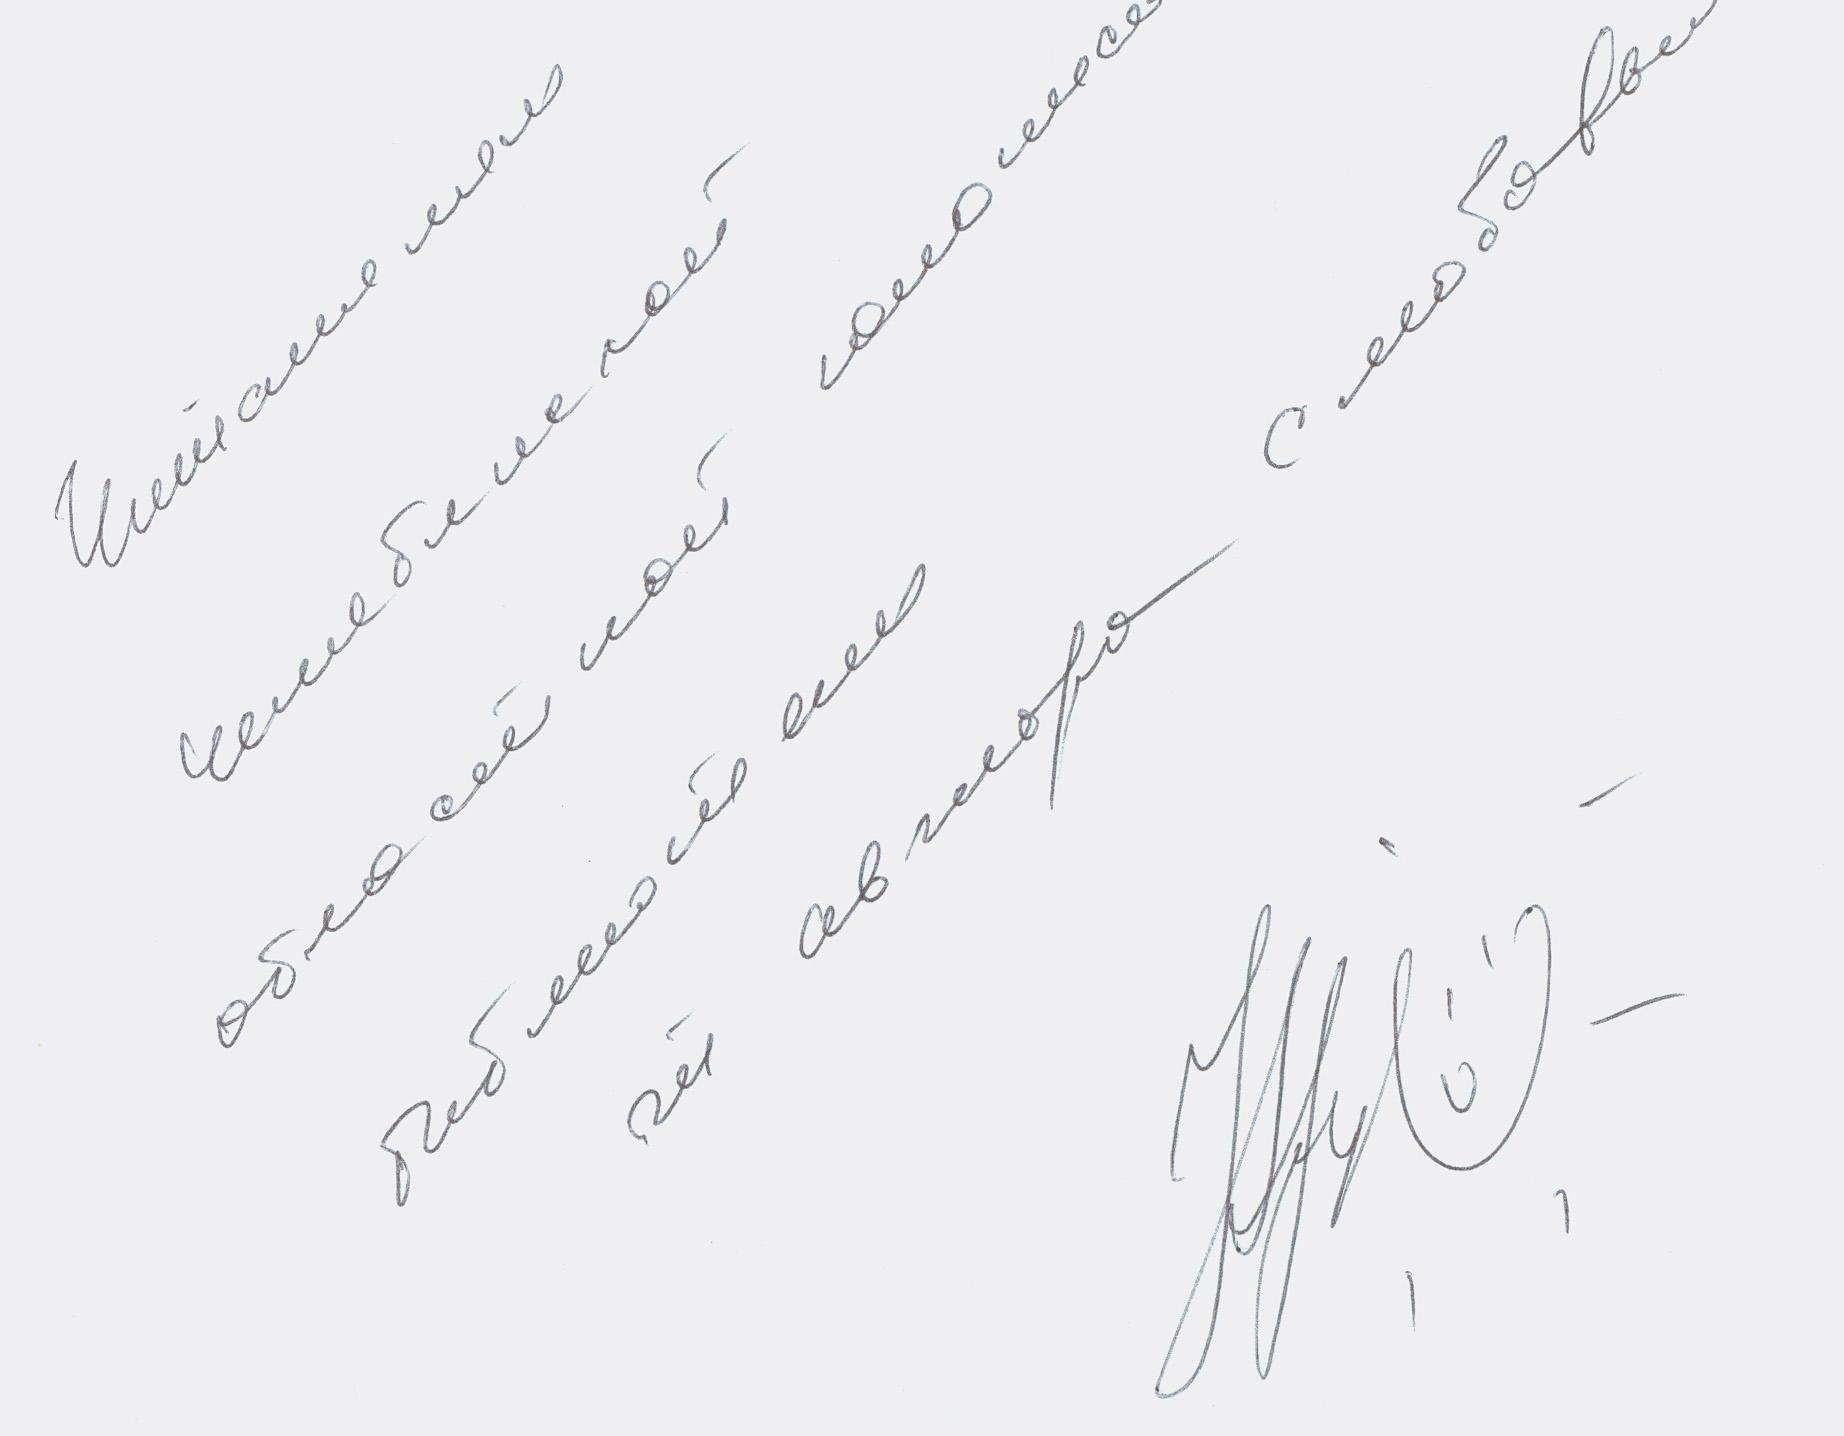 Н. Крупина Автограф на книге. ЧОЮБ